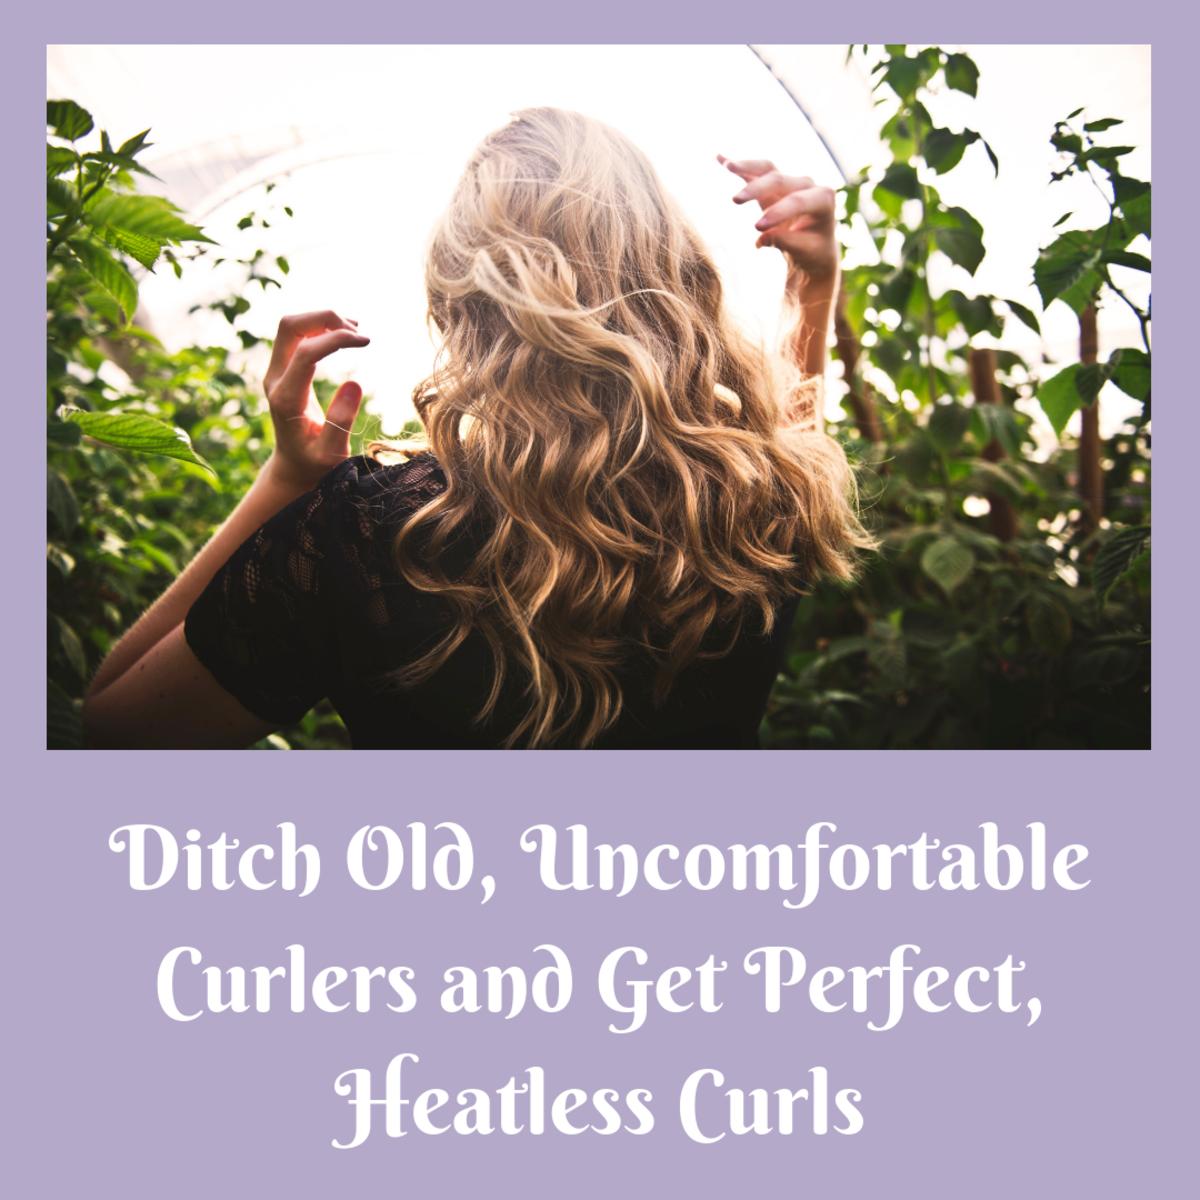 5 Ways to Get Overnight Heatless Curls